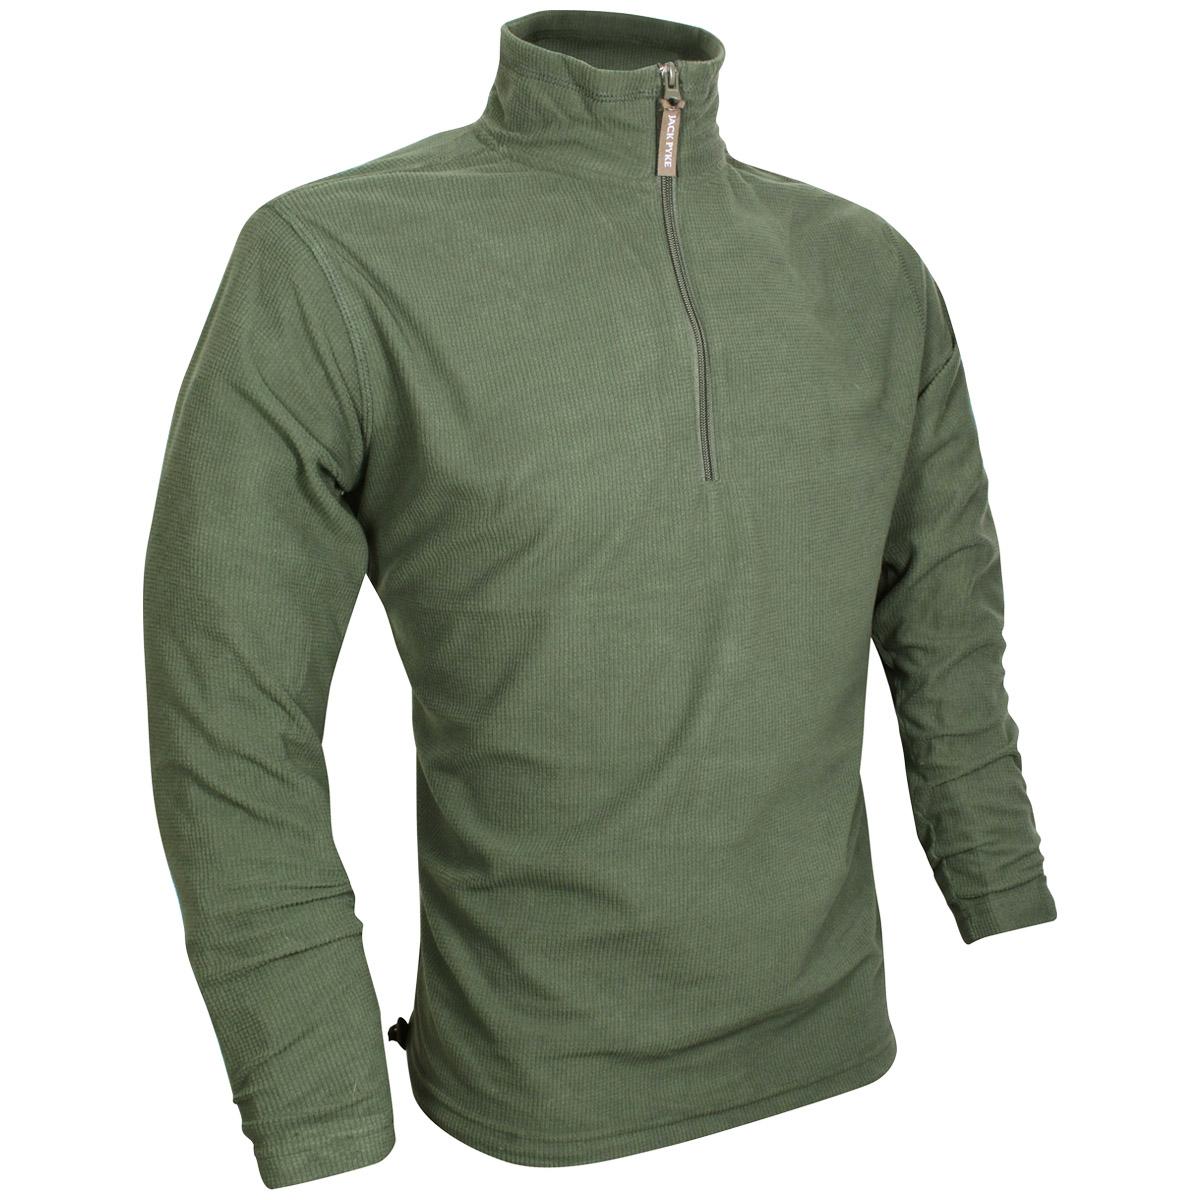 Jack pyke lightweight fleece top polar jacket mens hiking for Lightweight fishing pants